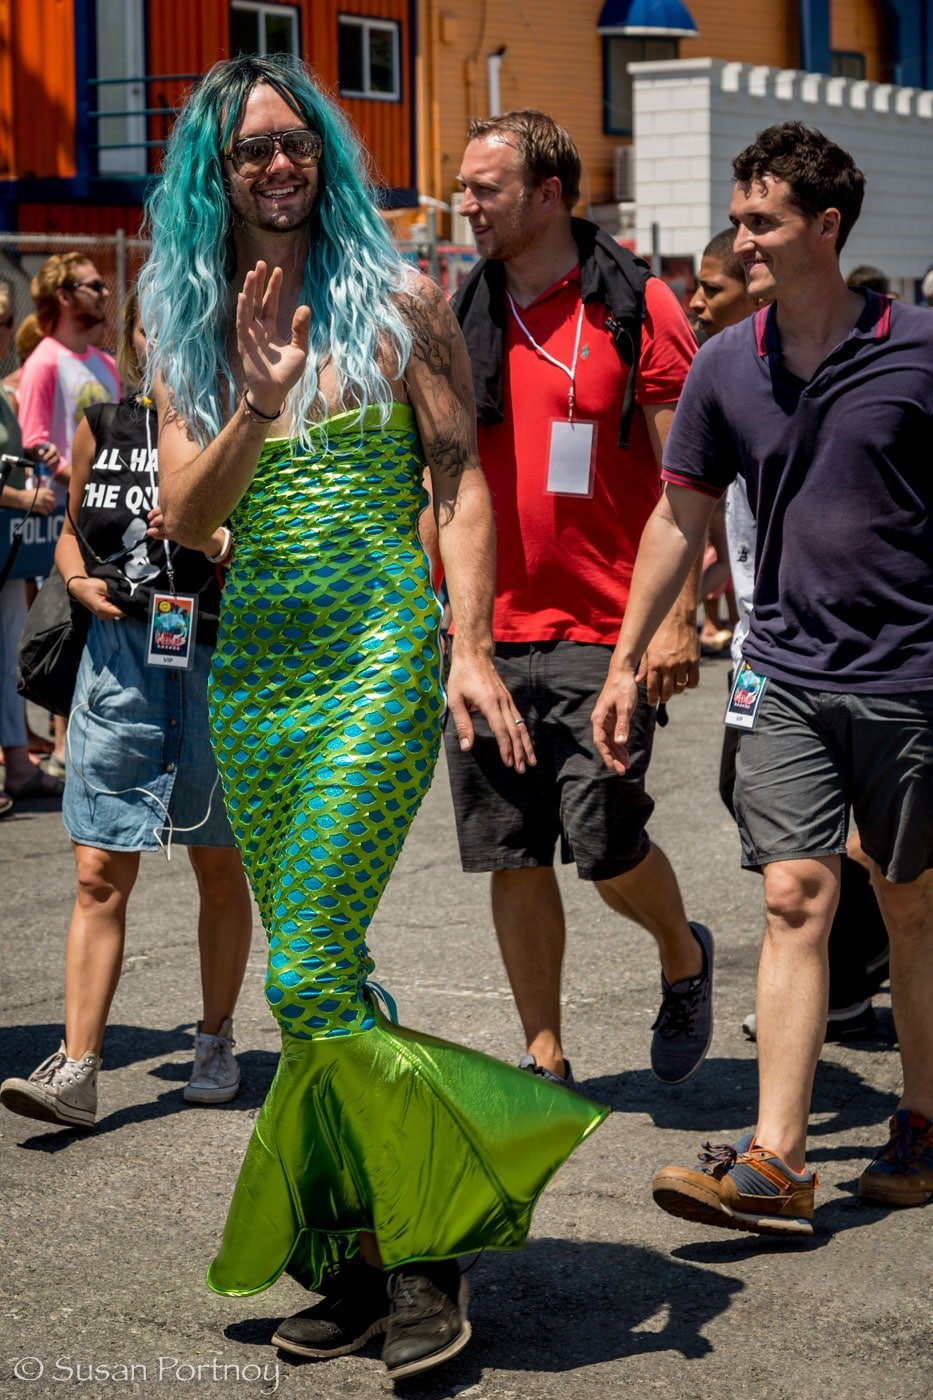 Man dressed as a mermaid at the Coney Island Mermaid Parade 2016